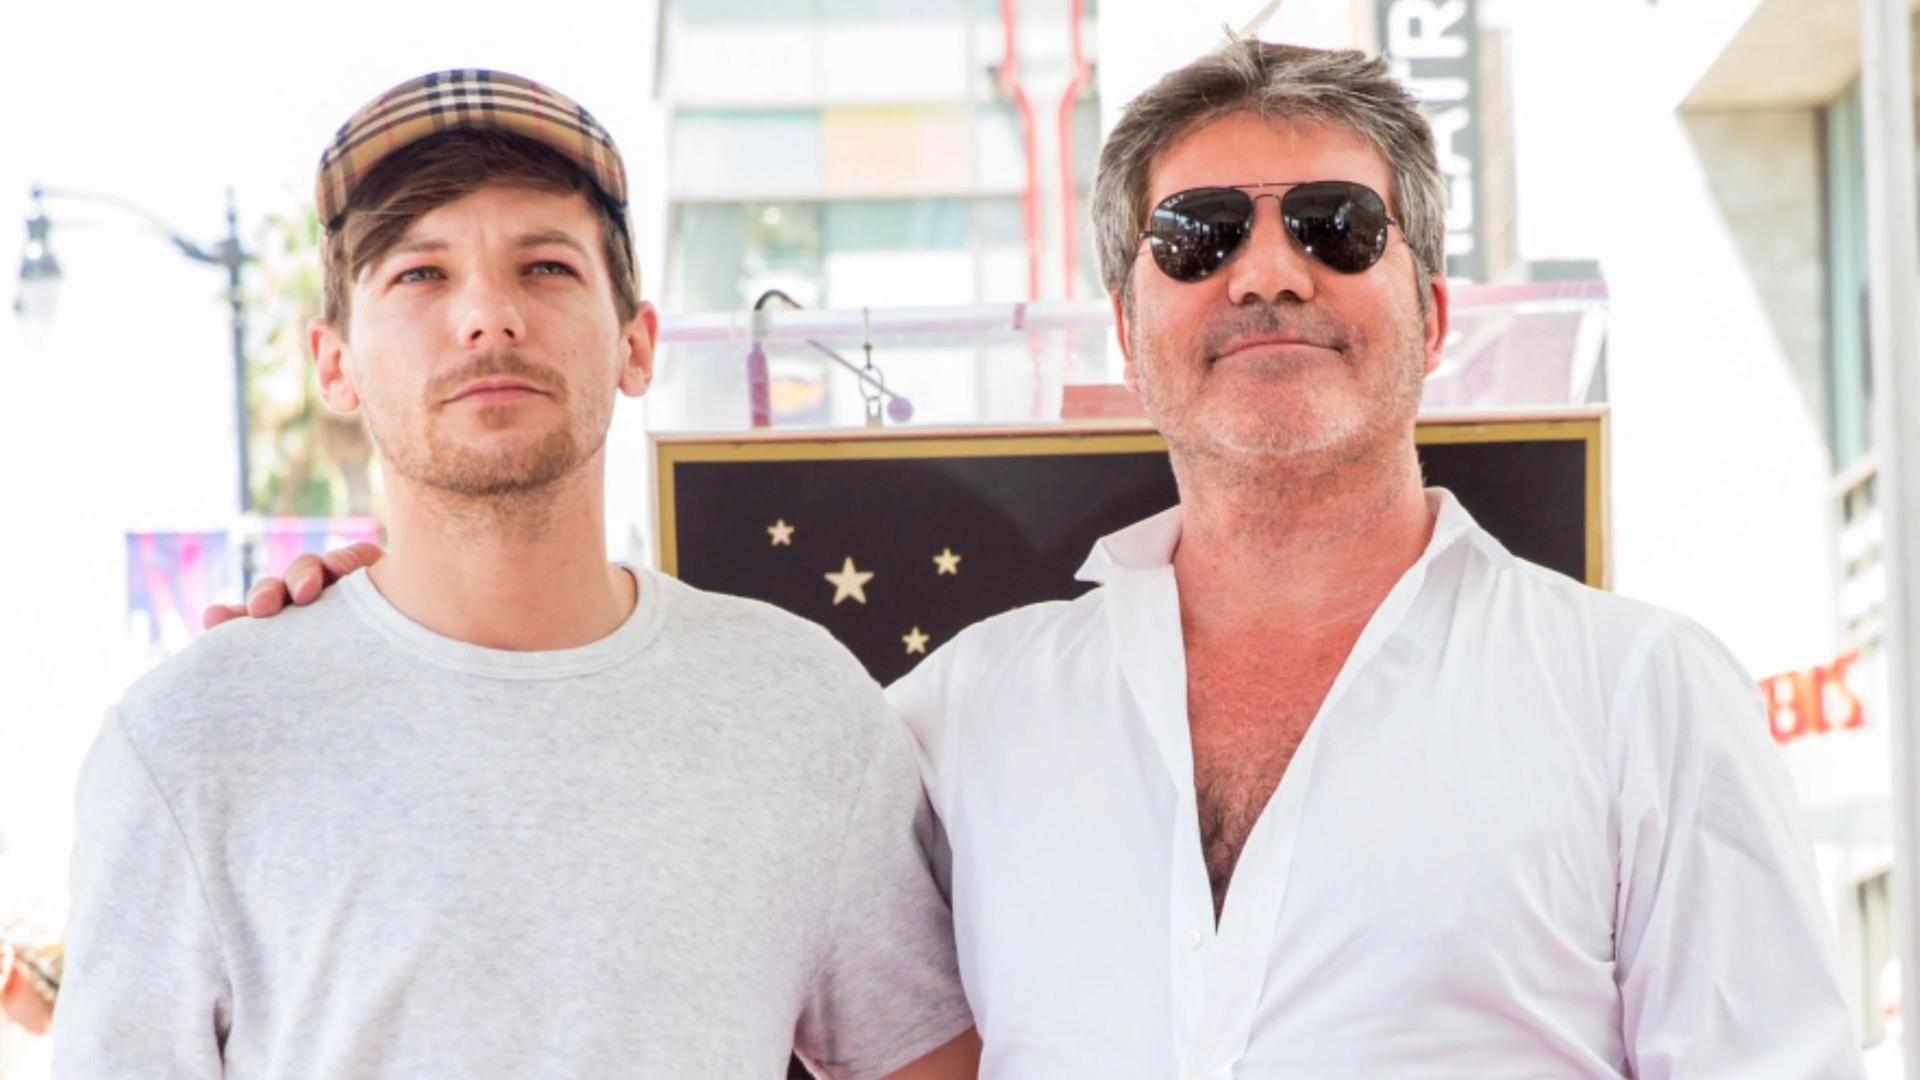 Louis Tomlinson exits Simon Cowell's record label